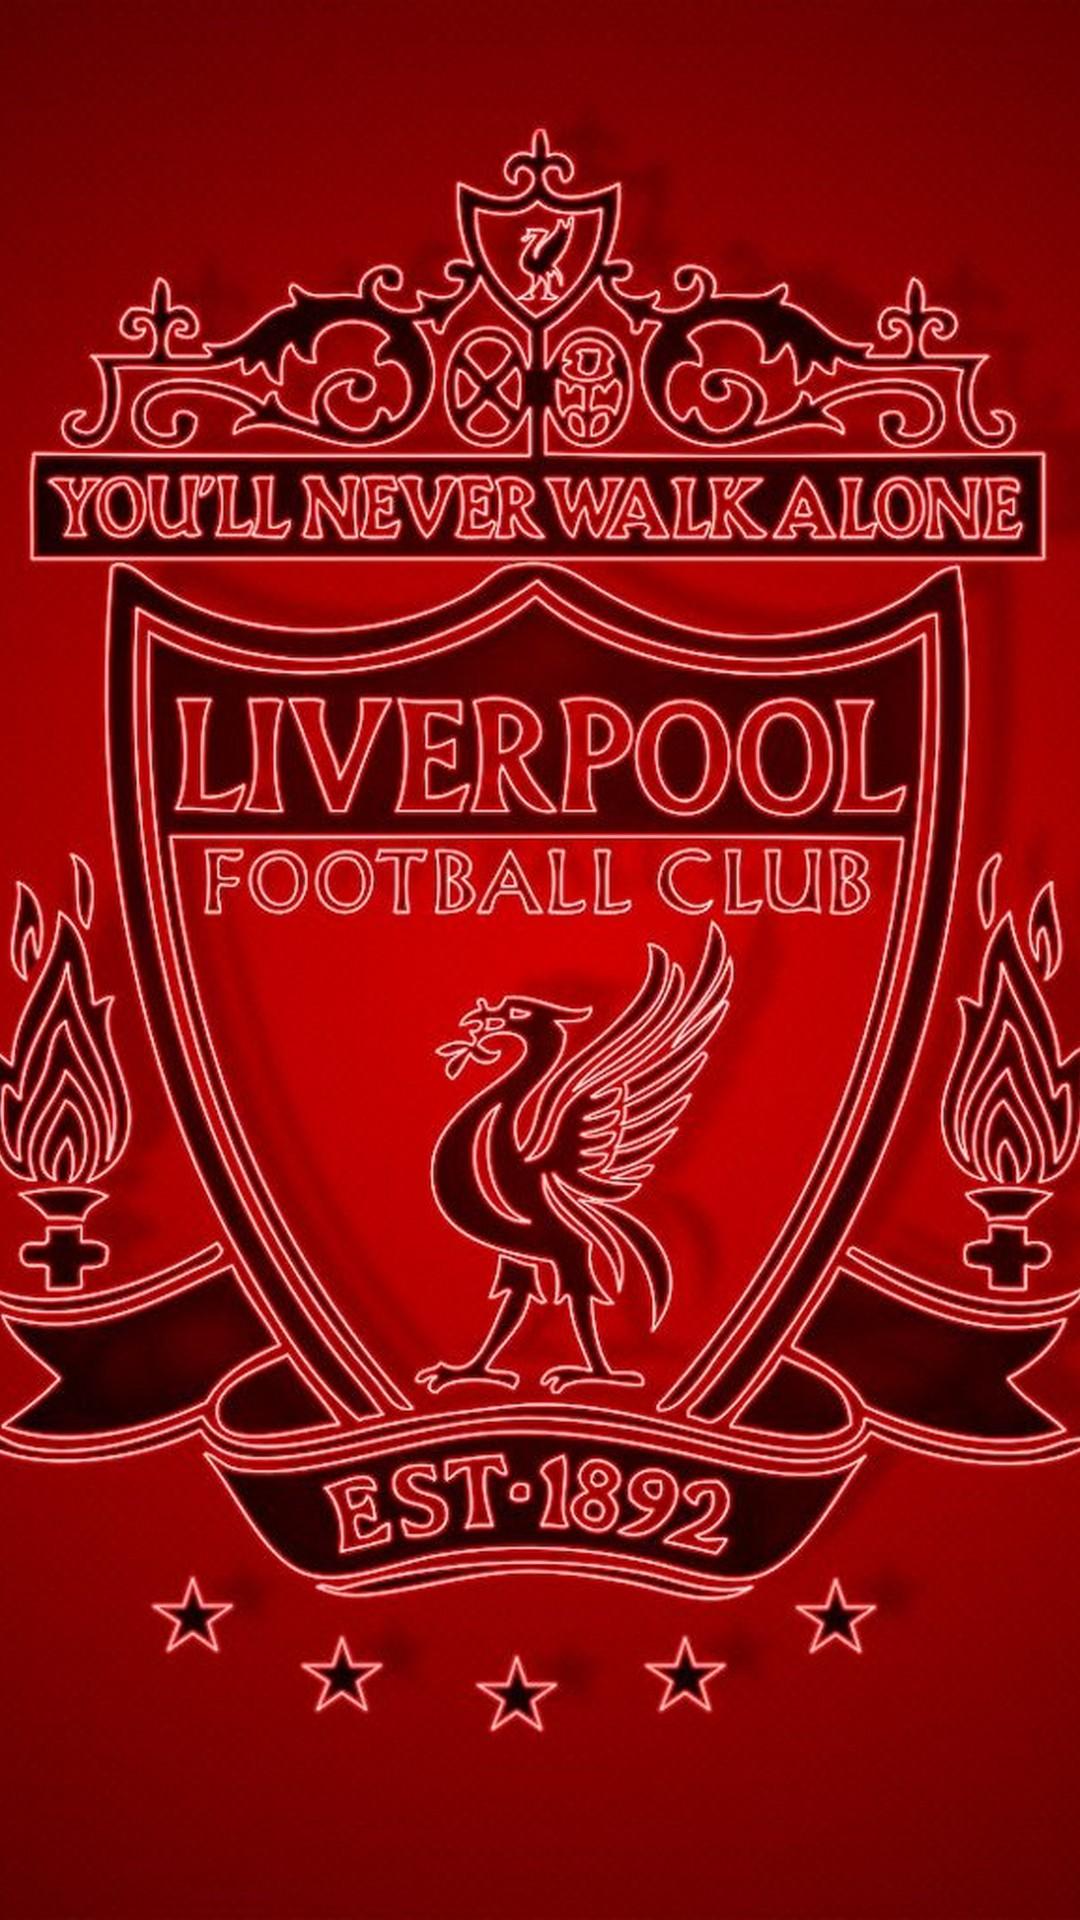 iPhone Wallpaper HD Liverpool 2021 Football Wallpaper 1080x1920